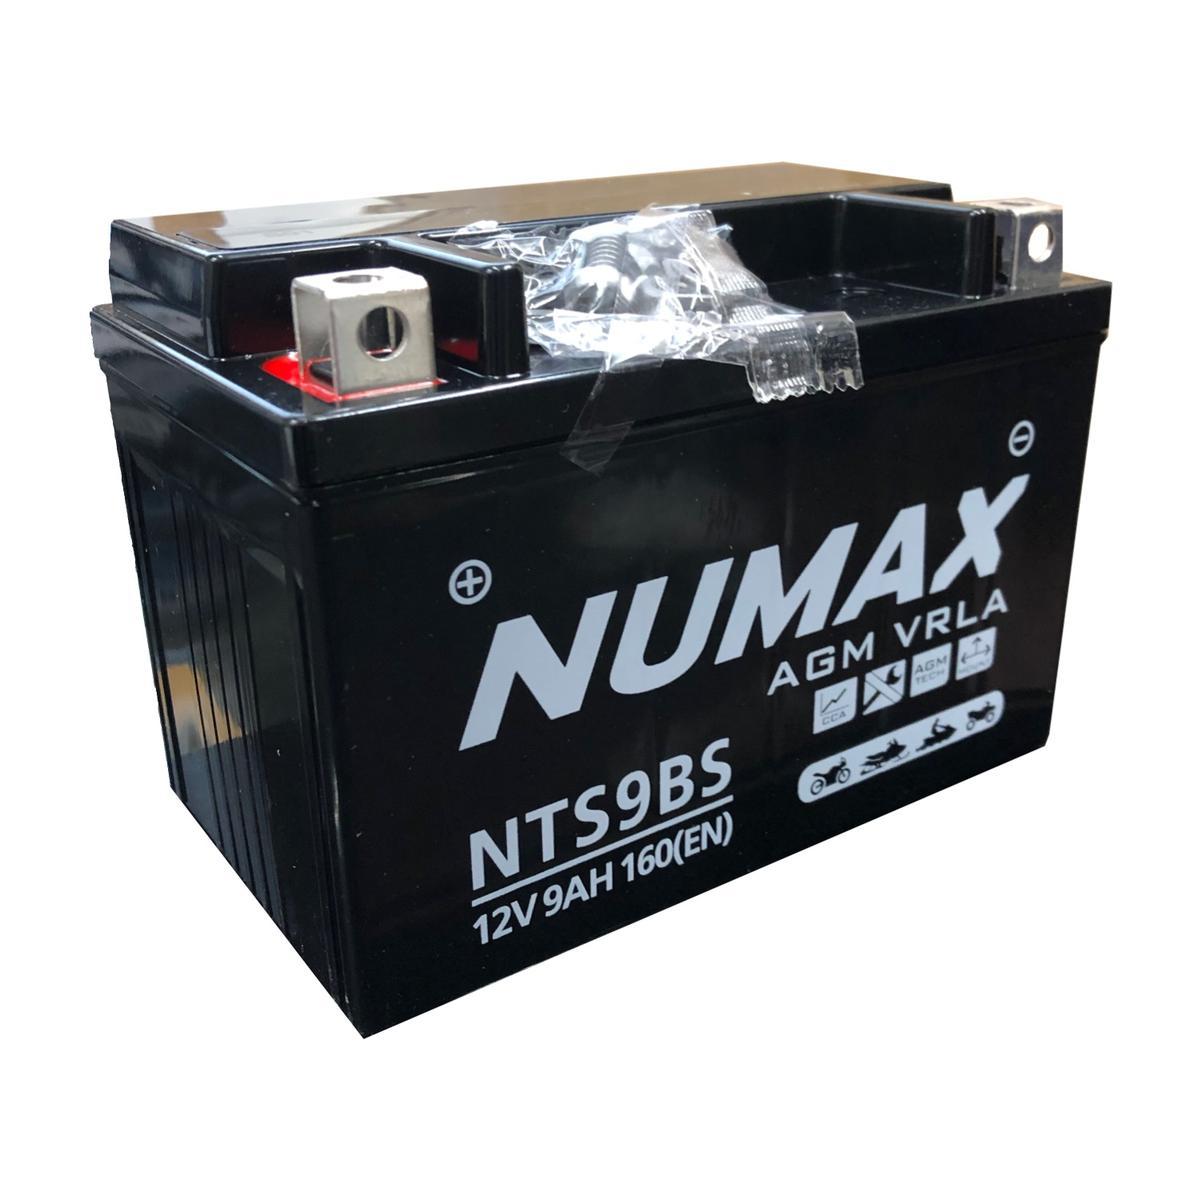 Numax NTS9BS 12v Motorbike Bike Gel Battery HONDA 600cc VT600 YXT9-4